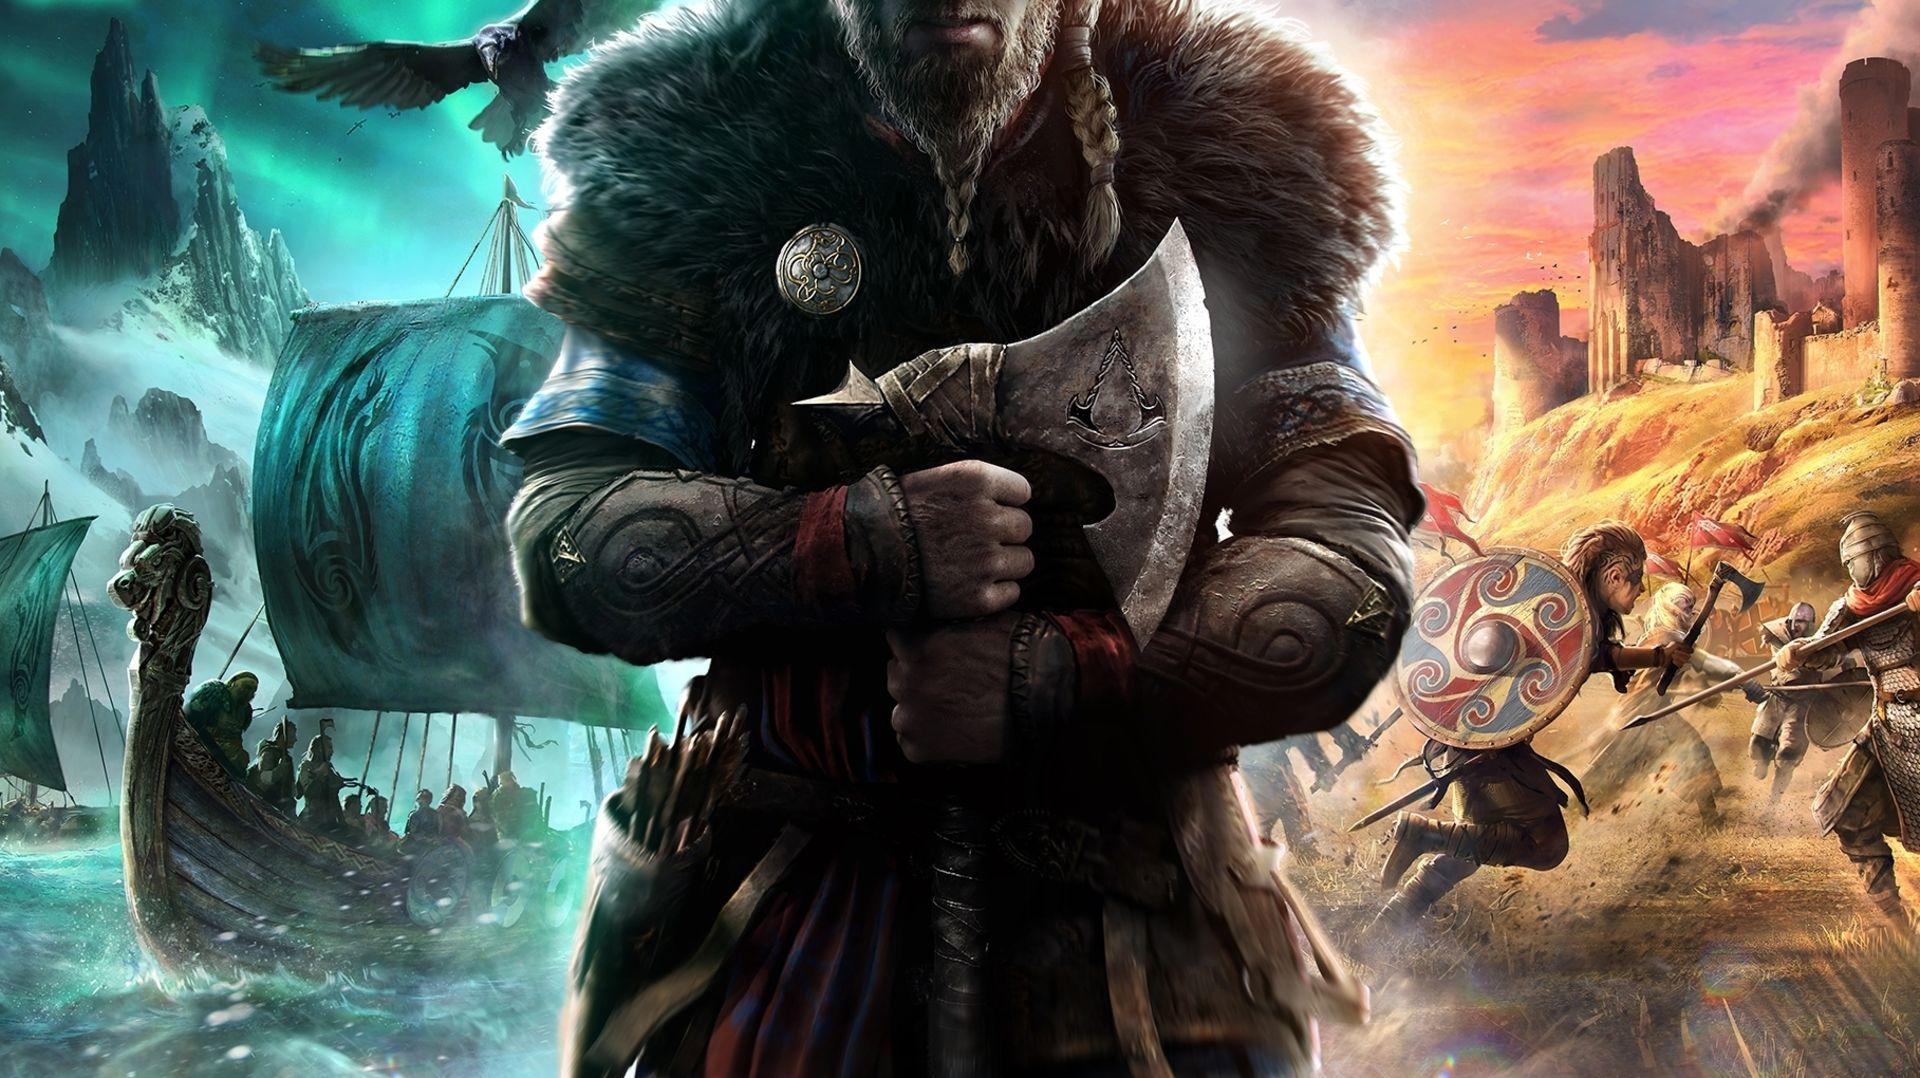 Assassins Creed Valhalla re min - خرید سی دی کی اشتراکی  Assassin's Creed Valhalla Ultimate Edition